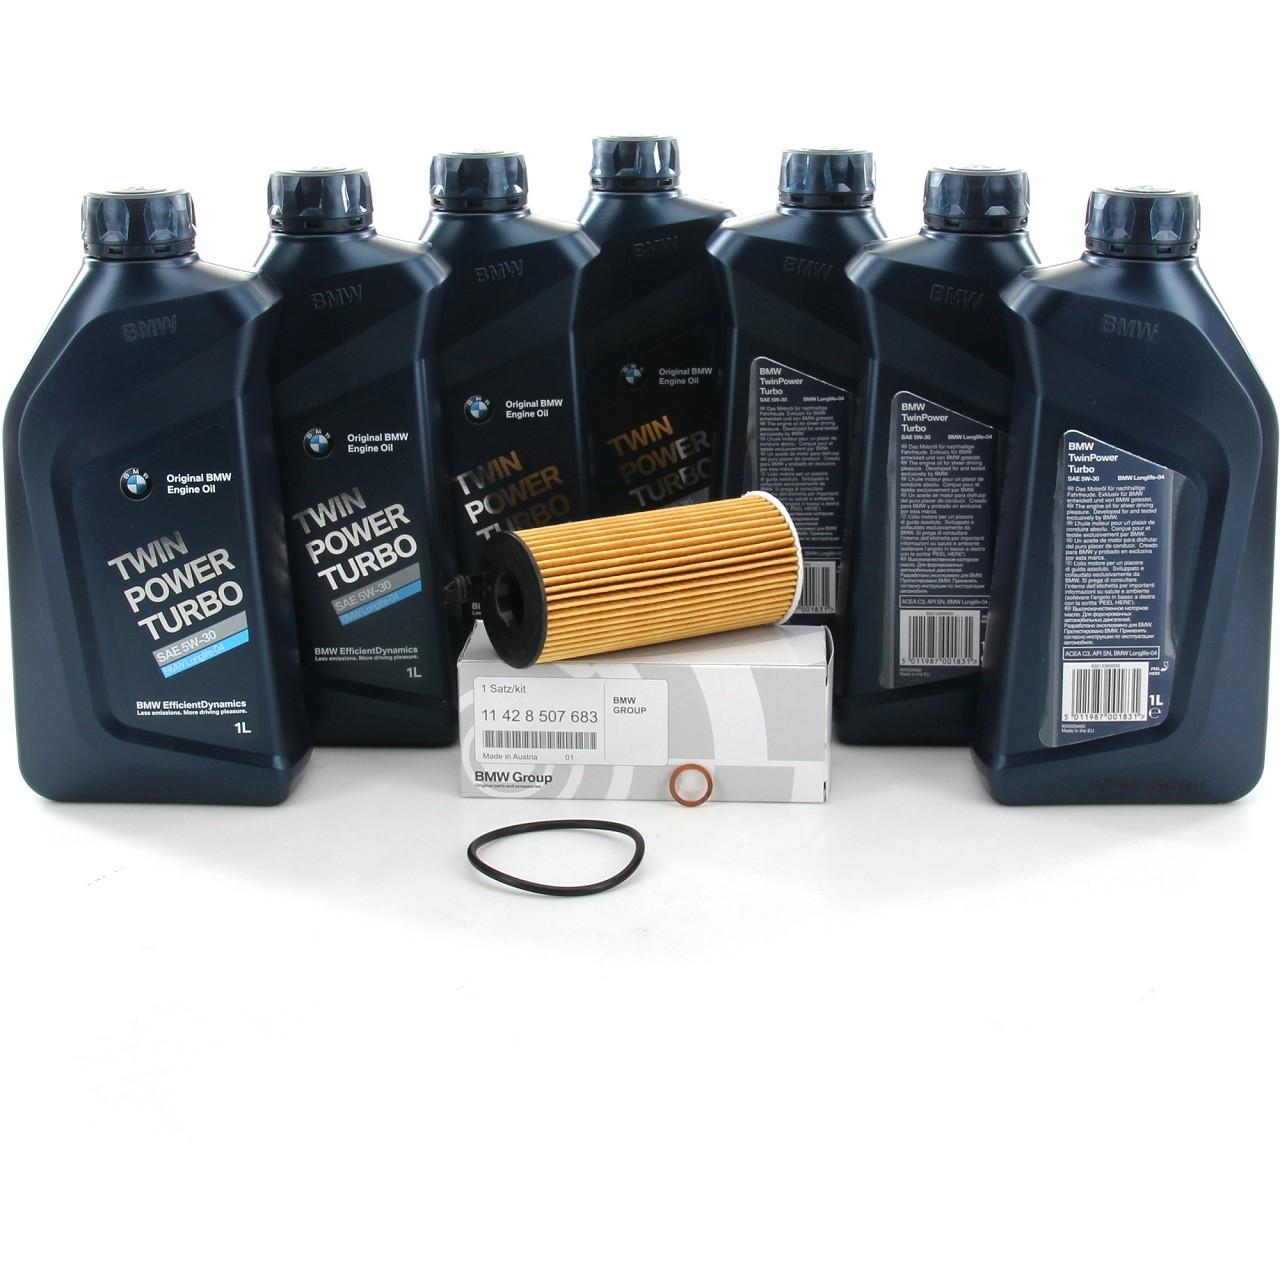 ORIGINAL BMW Motoröl Öl 5W30 LongLife-04 7 Liter + Ölfilter 11428507683